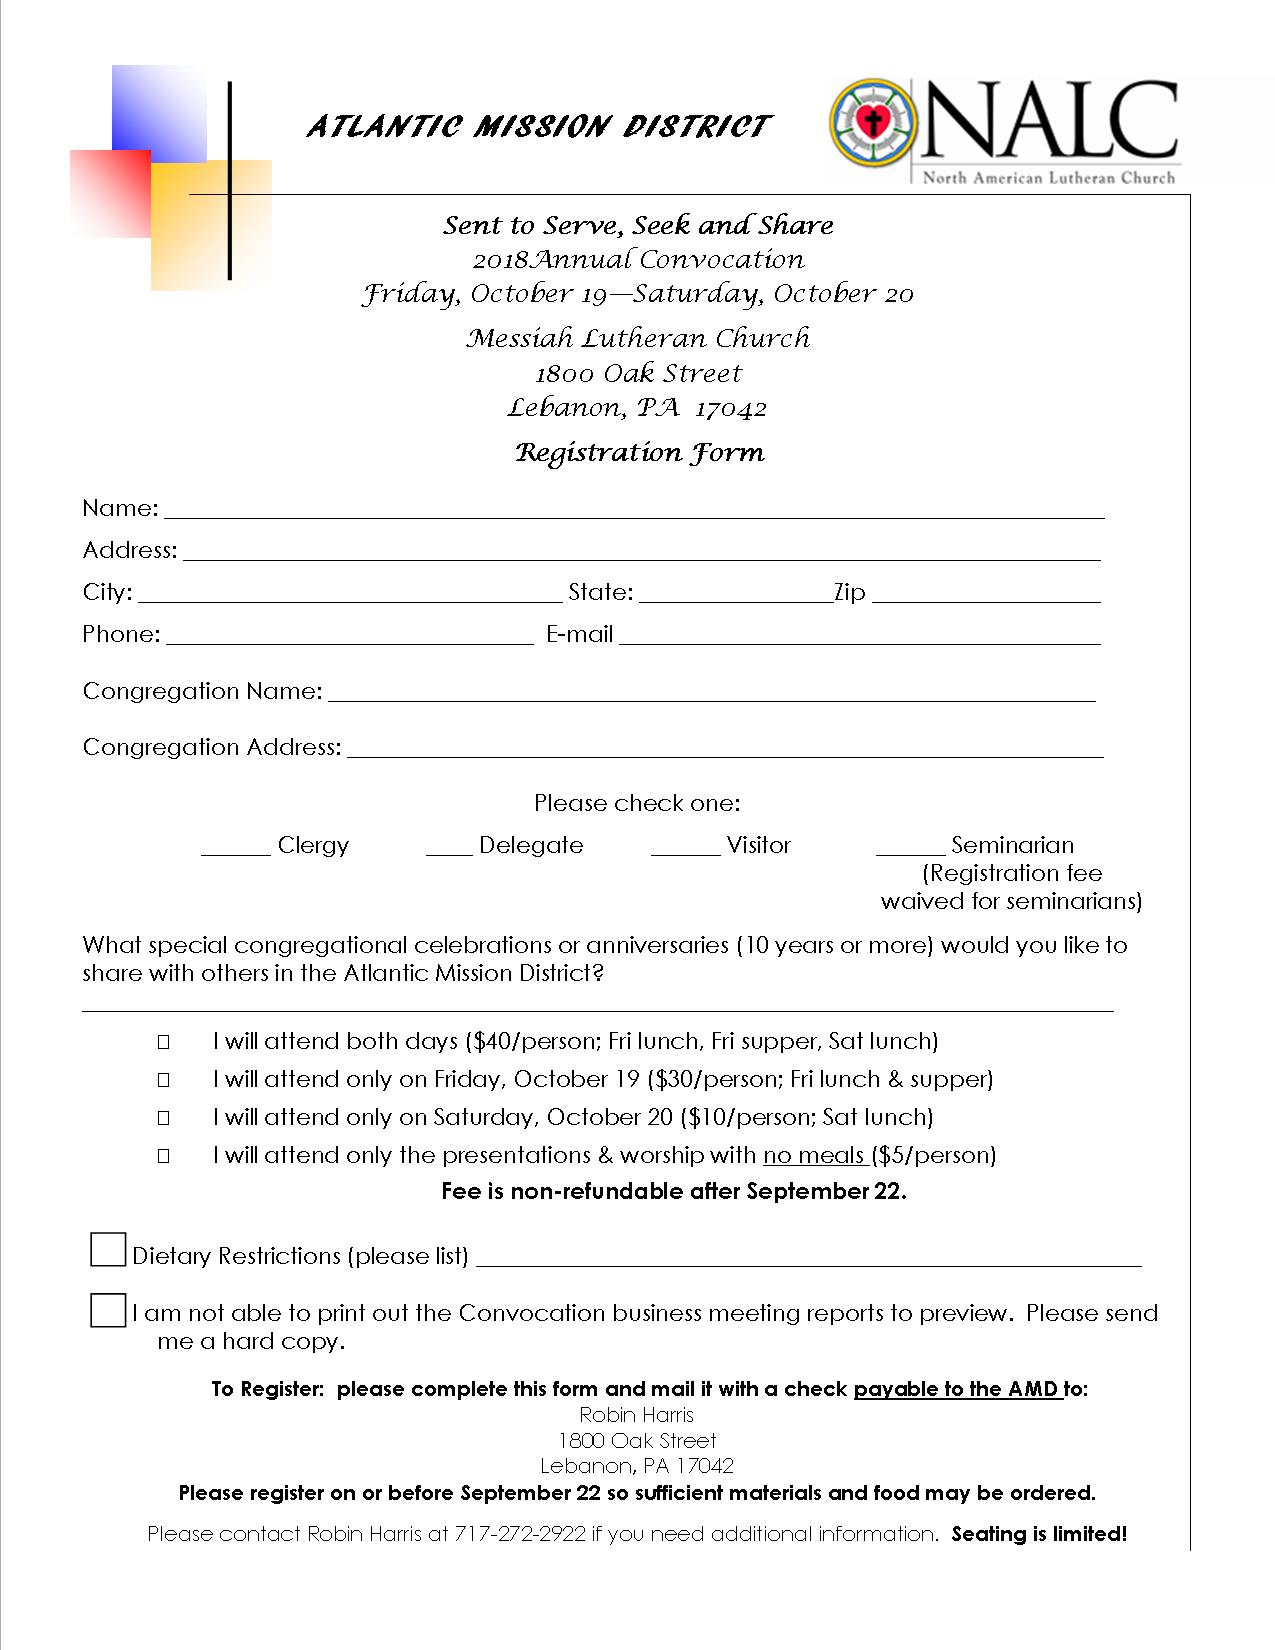 Convocation Registration Form